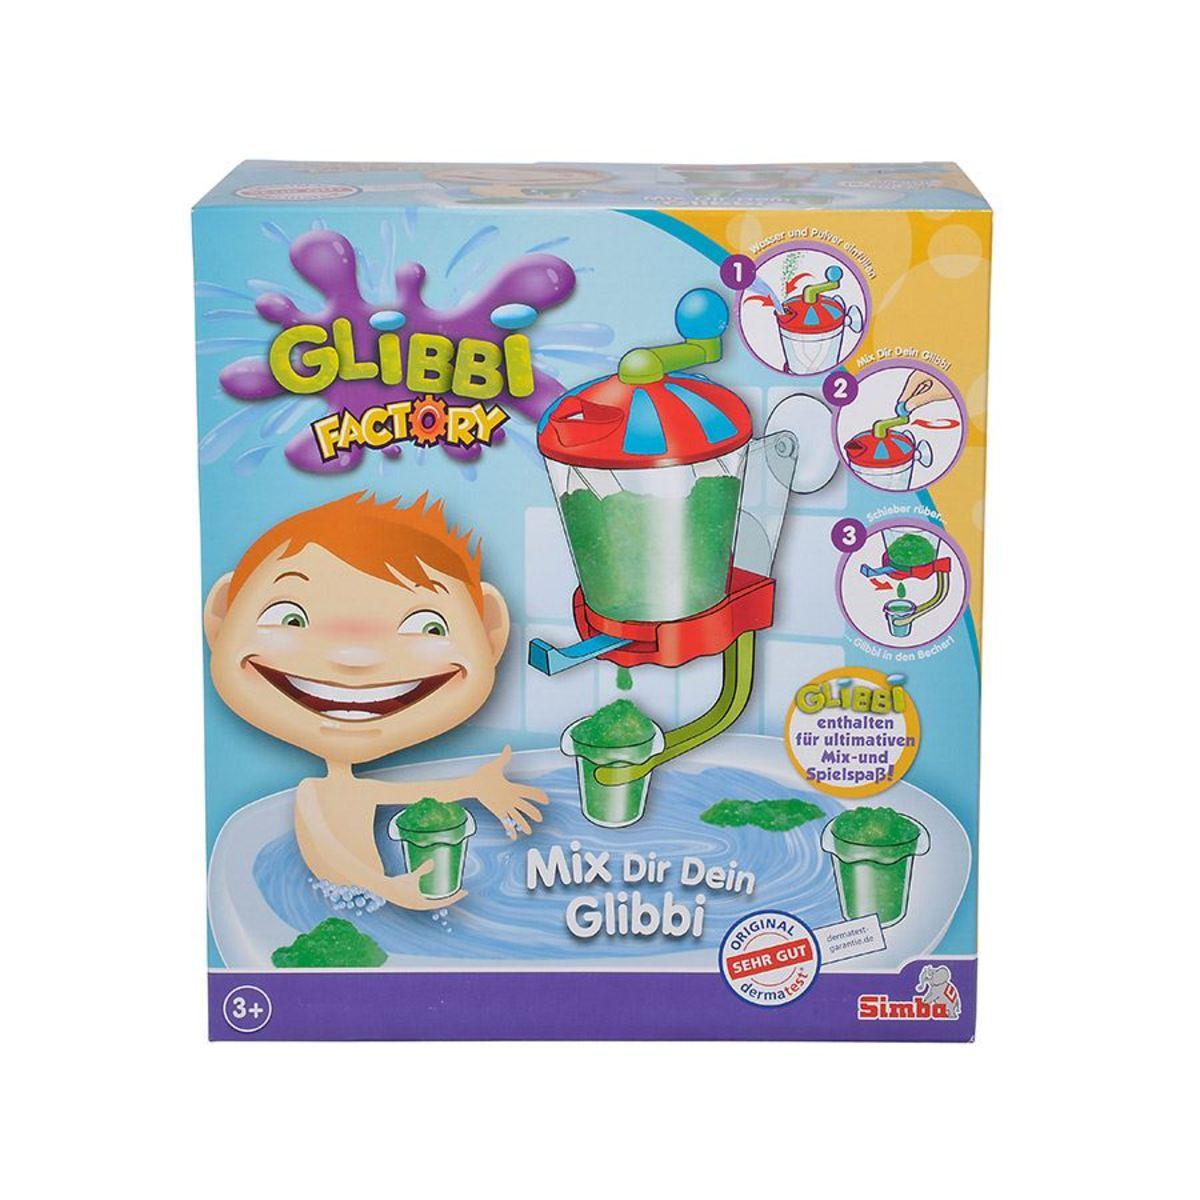 Bild 4 von Simba Toys Glibbi Factory